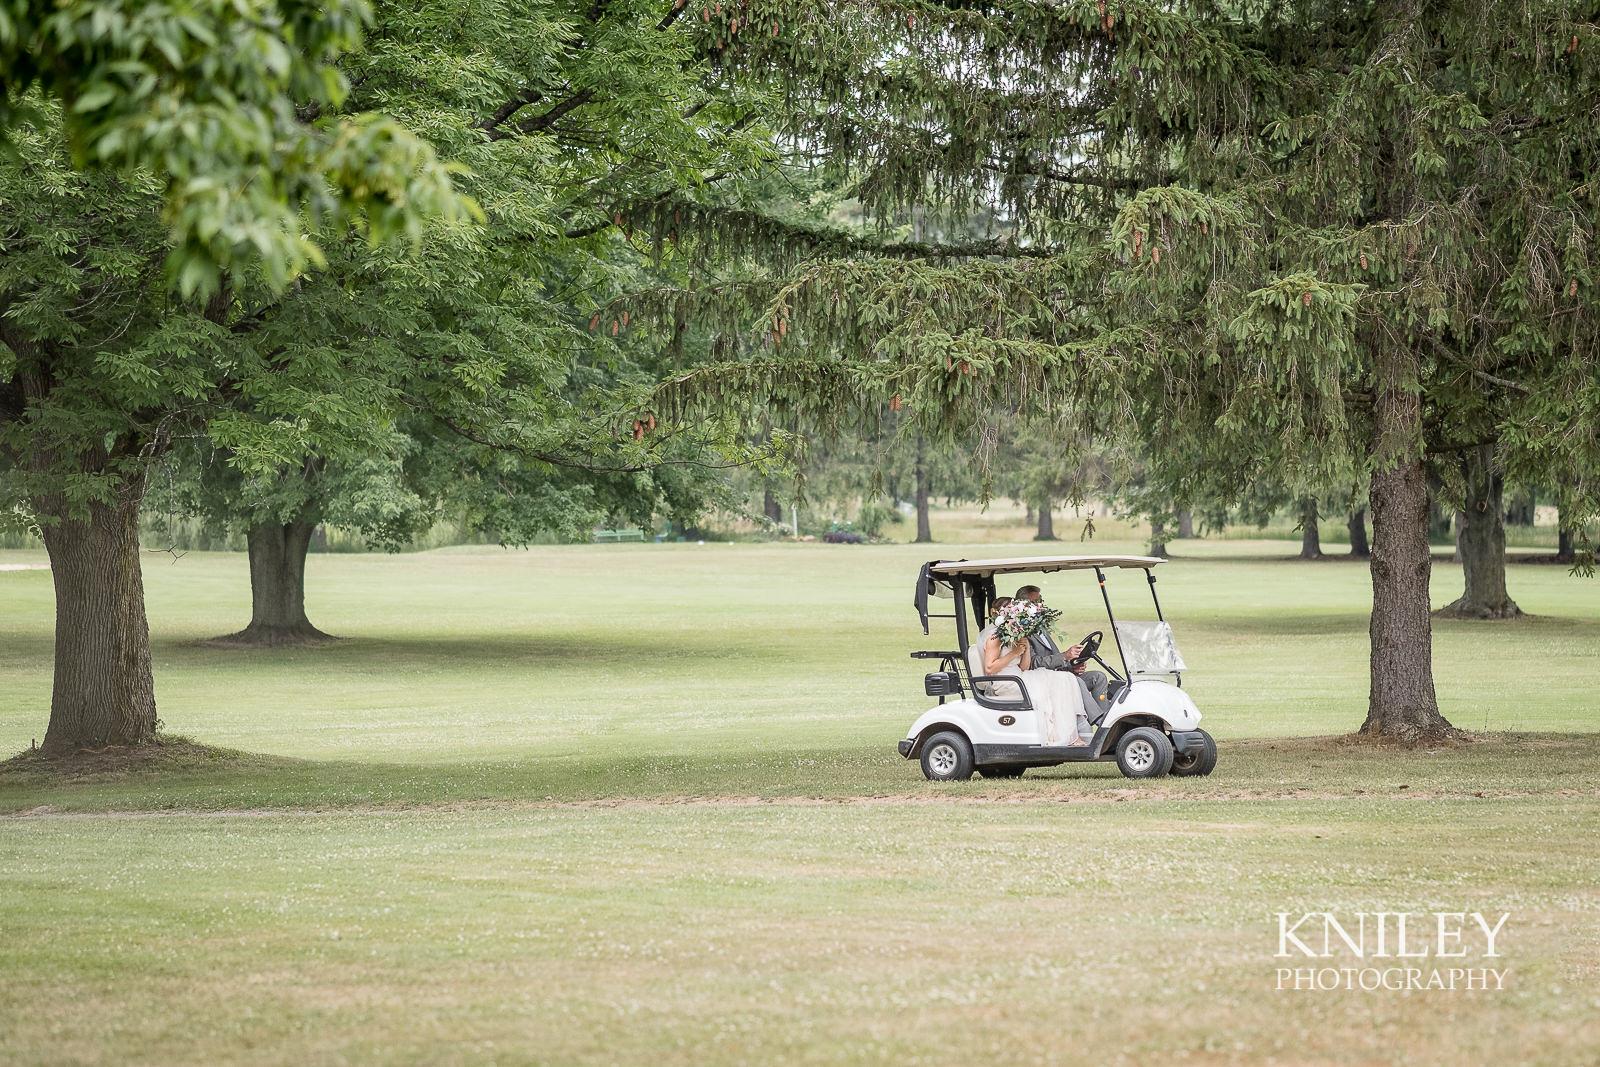 037 - Ontario Golf Club Wedding Pictures - XT2A6613.jpg